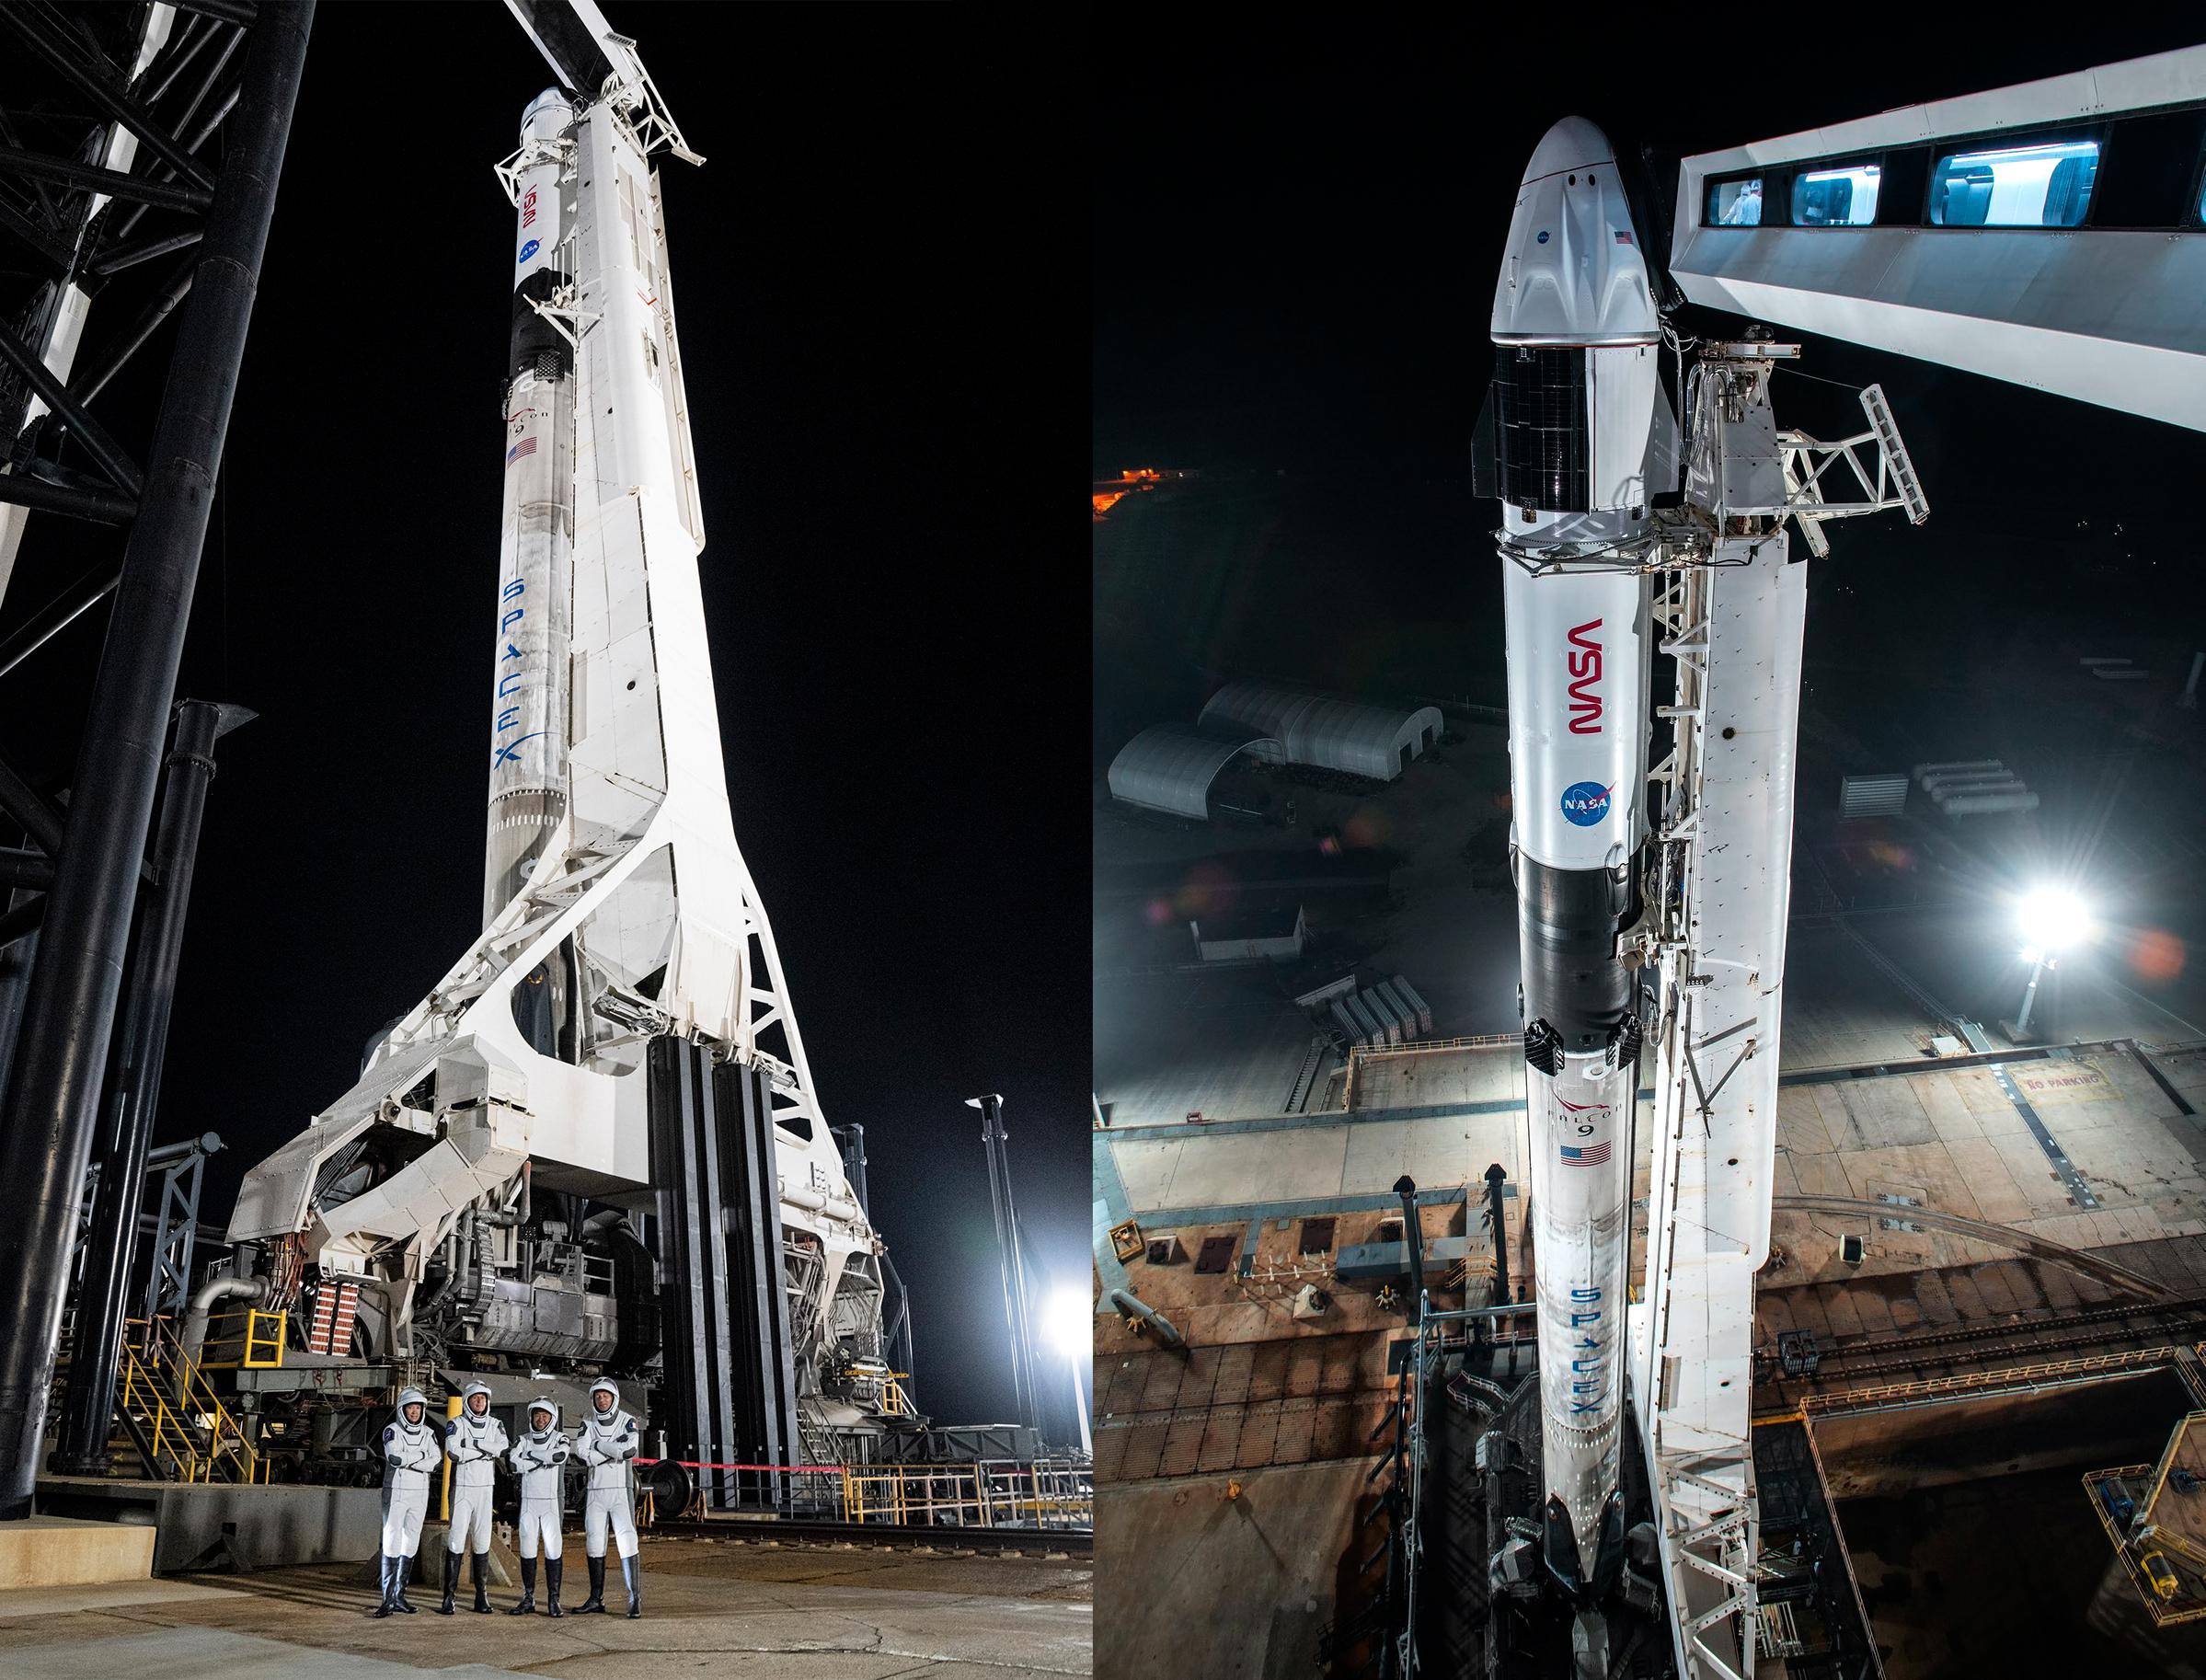 Crew-2 Crew Dragon C206 Falcon 9 B1061 39A 041621 (SpaceX) vertical (c)